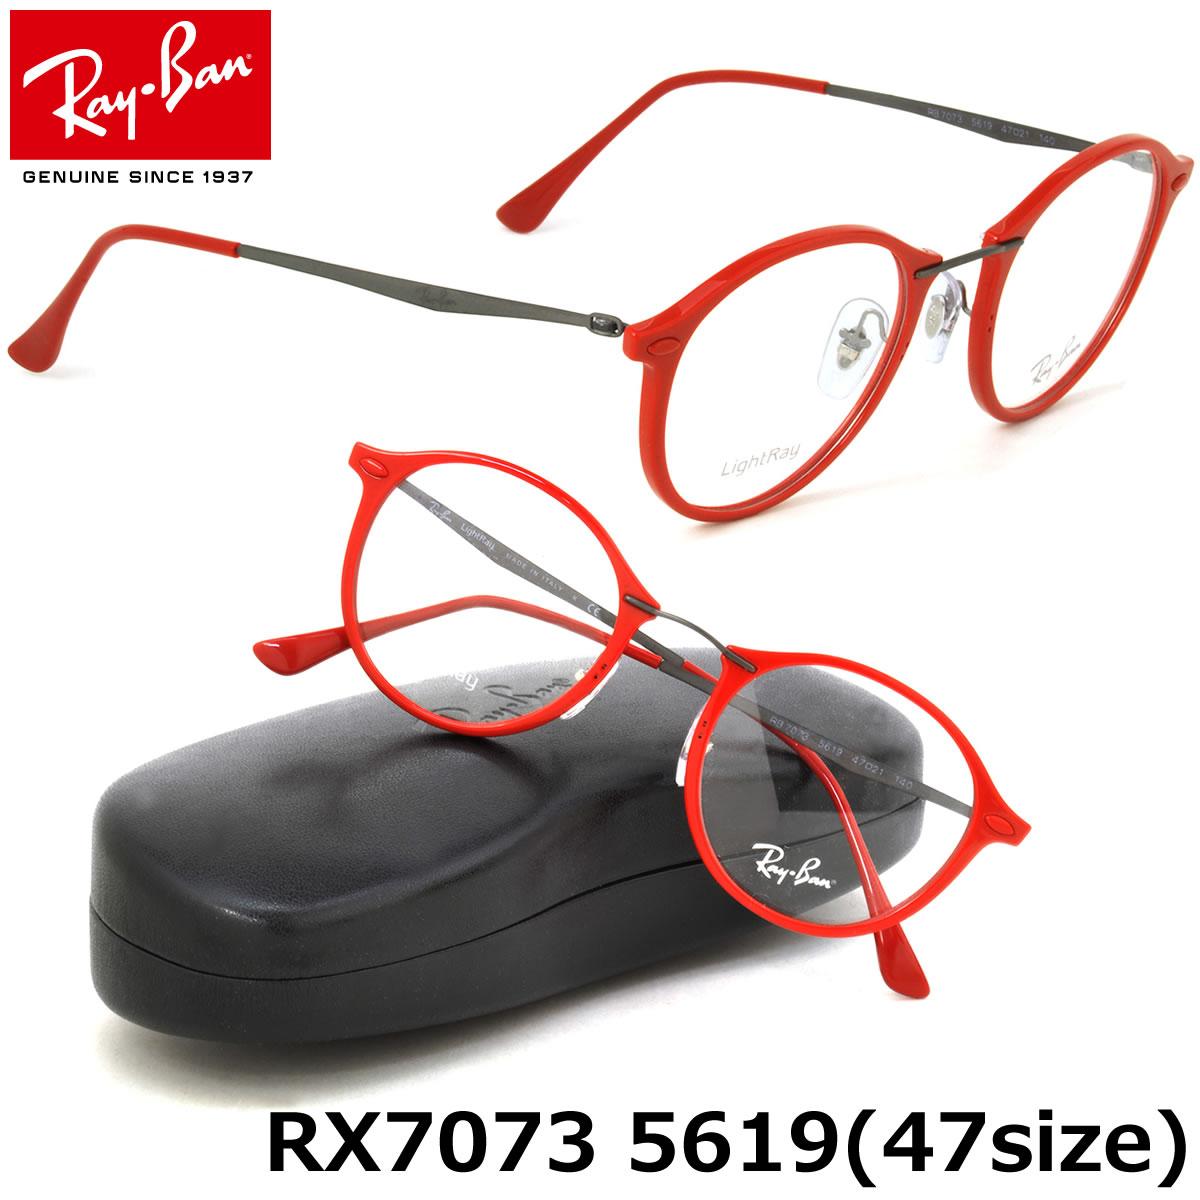 9aecfb4460 (Ray-Ban) tech light Ray glasses frames RX7073 5619 47 size round round  glasses ROUND Ray-Ban RAYBAN TECH ROUND LIGHT RAY men s women s